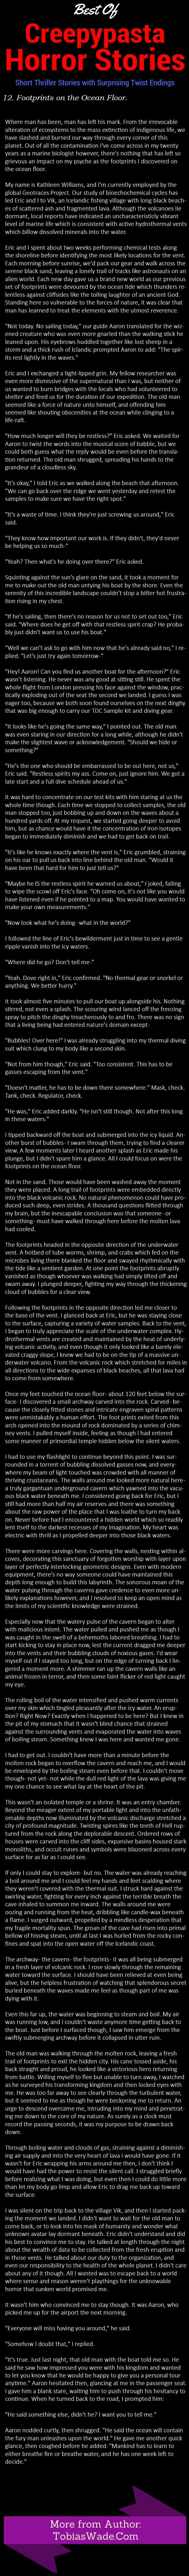 sykesville monster allegations paranormal legends pinterest